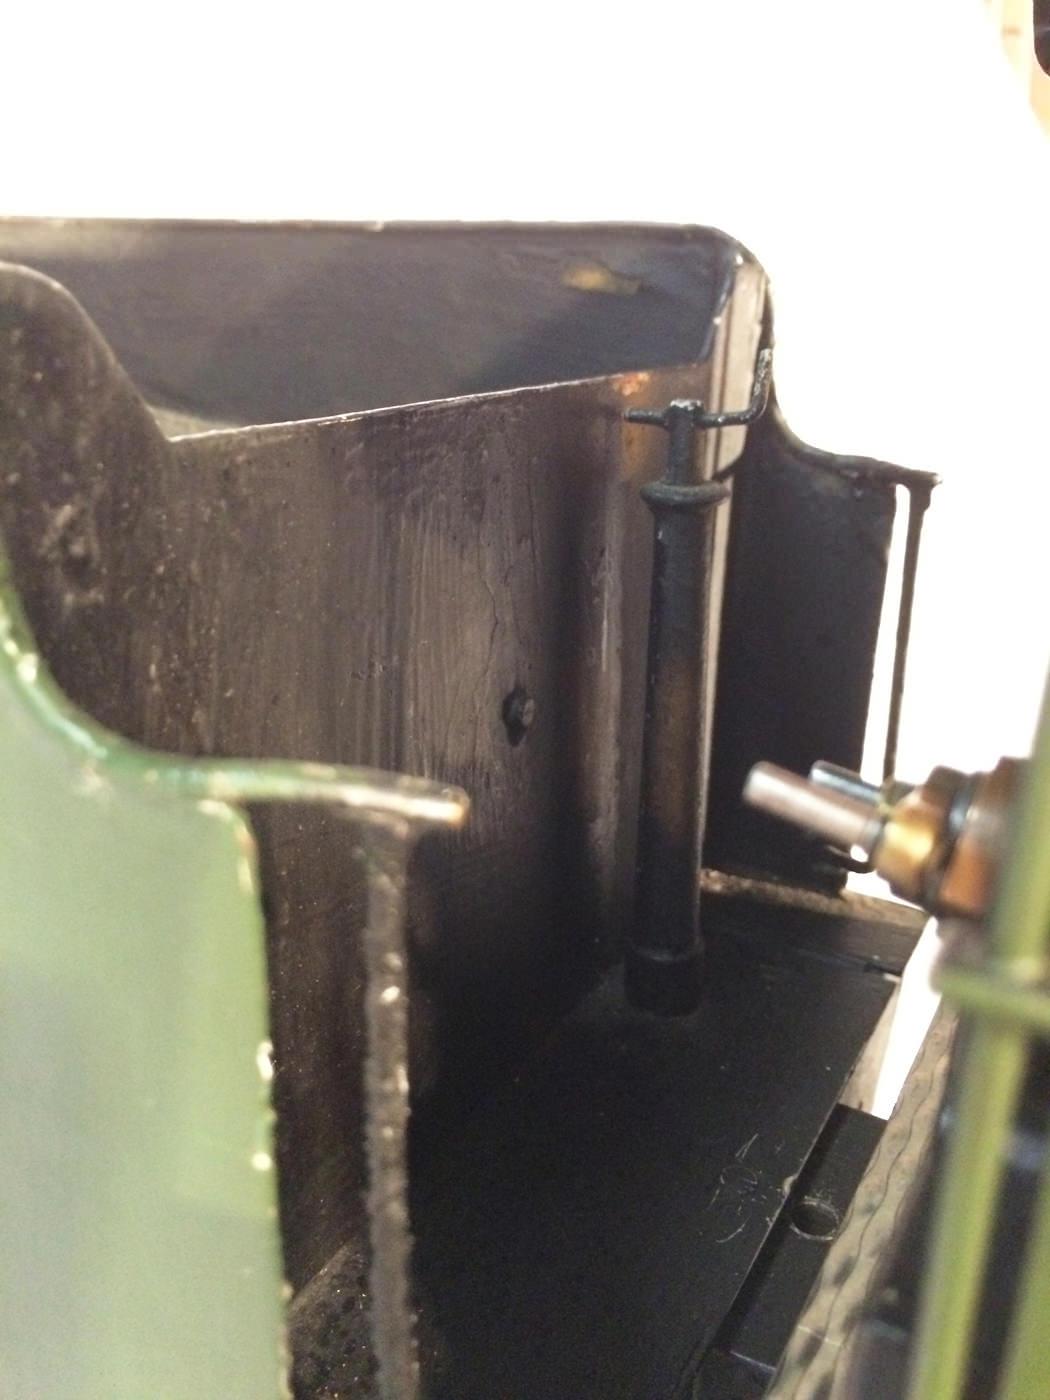 test 3 gauge GWR Hawksworth County live steam locomotive for sale